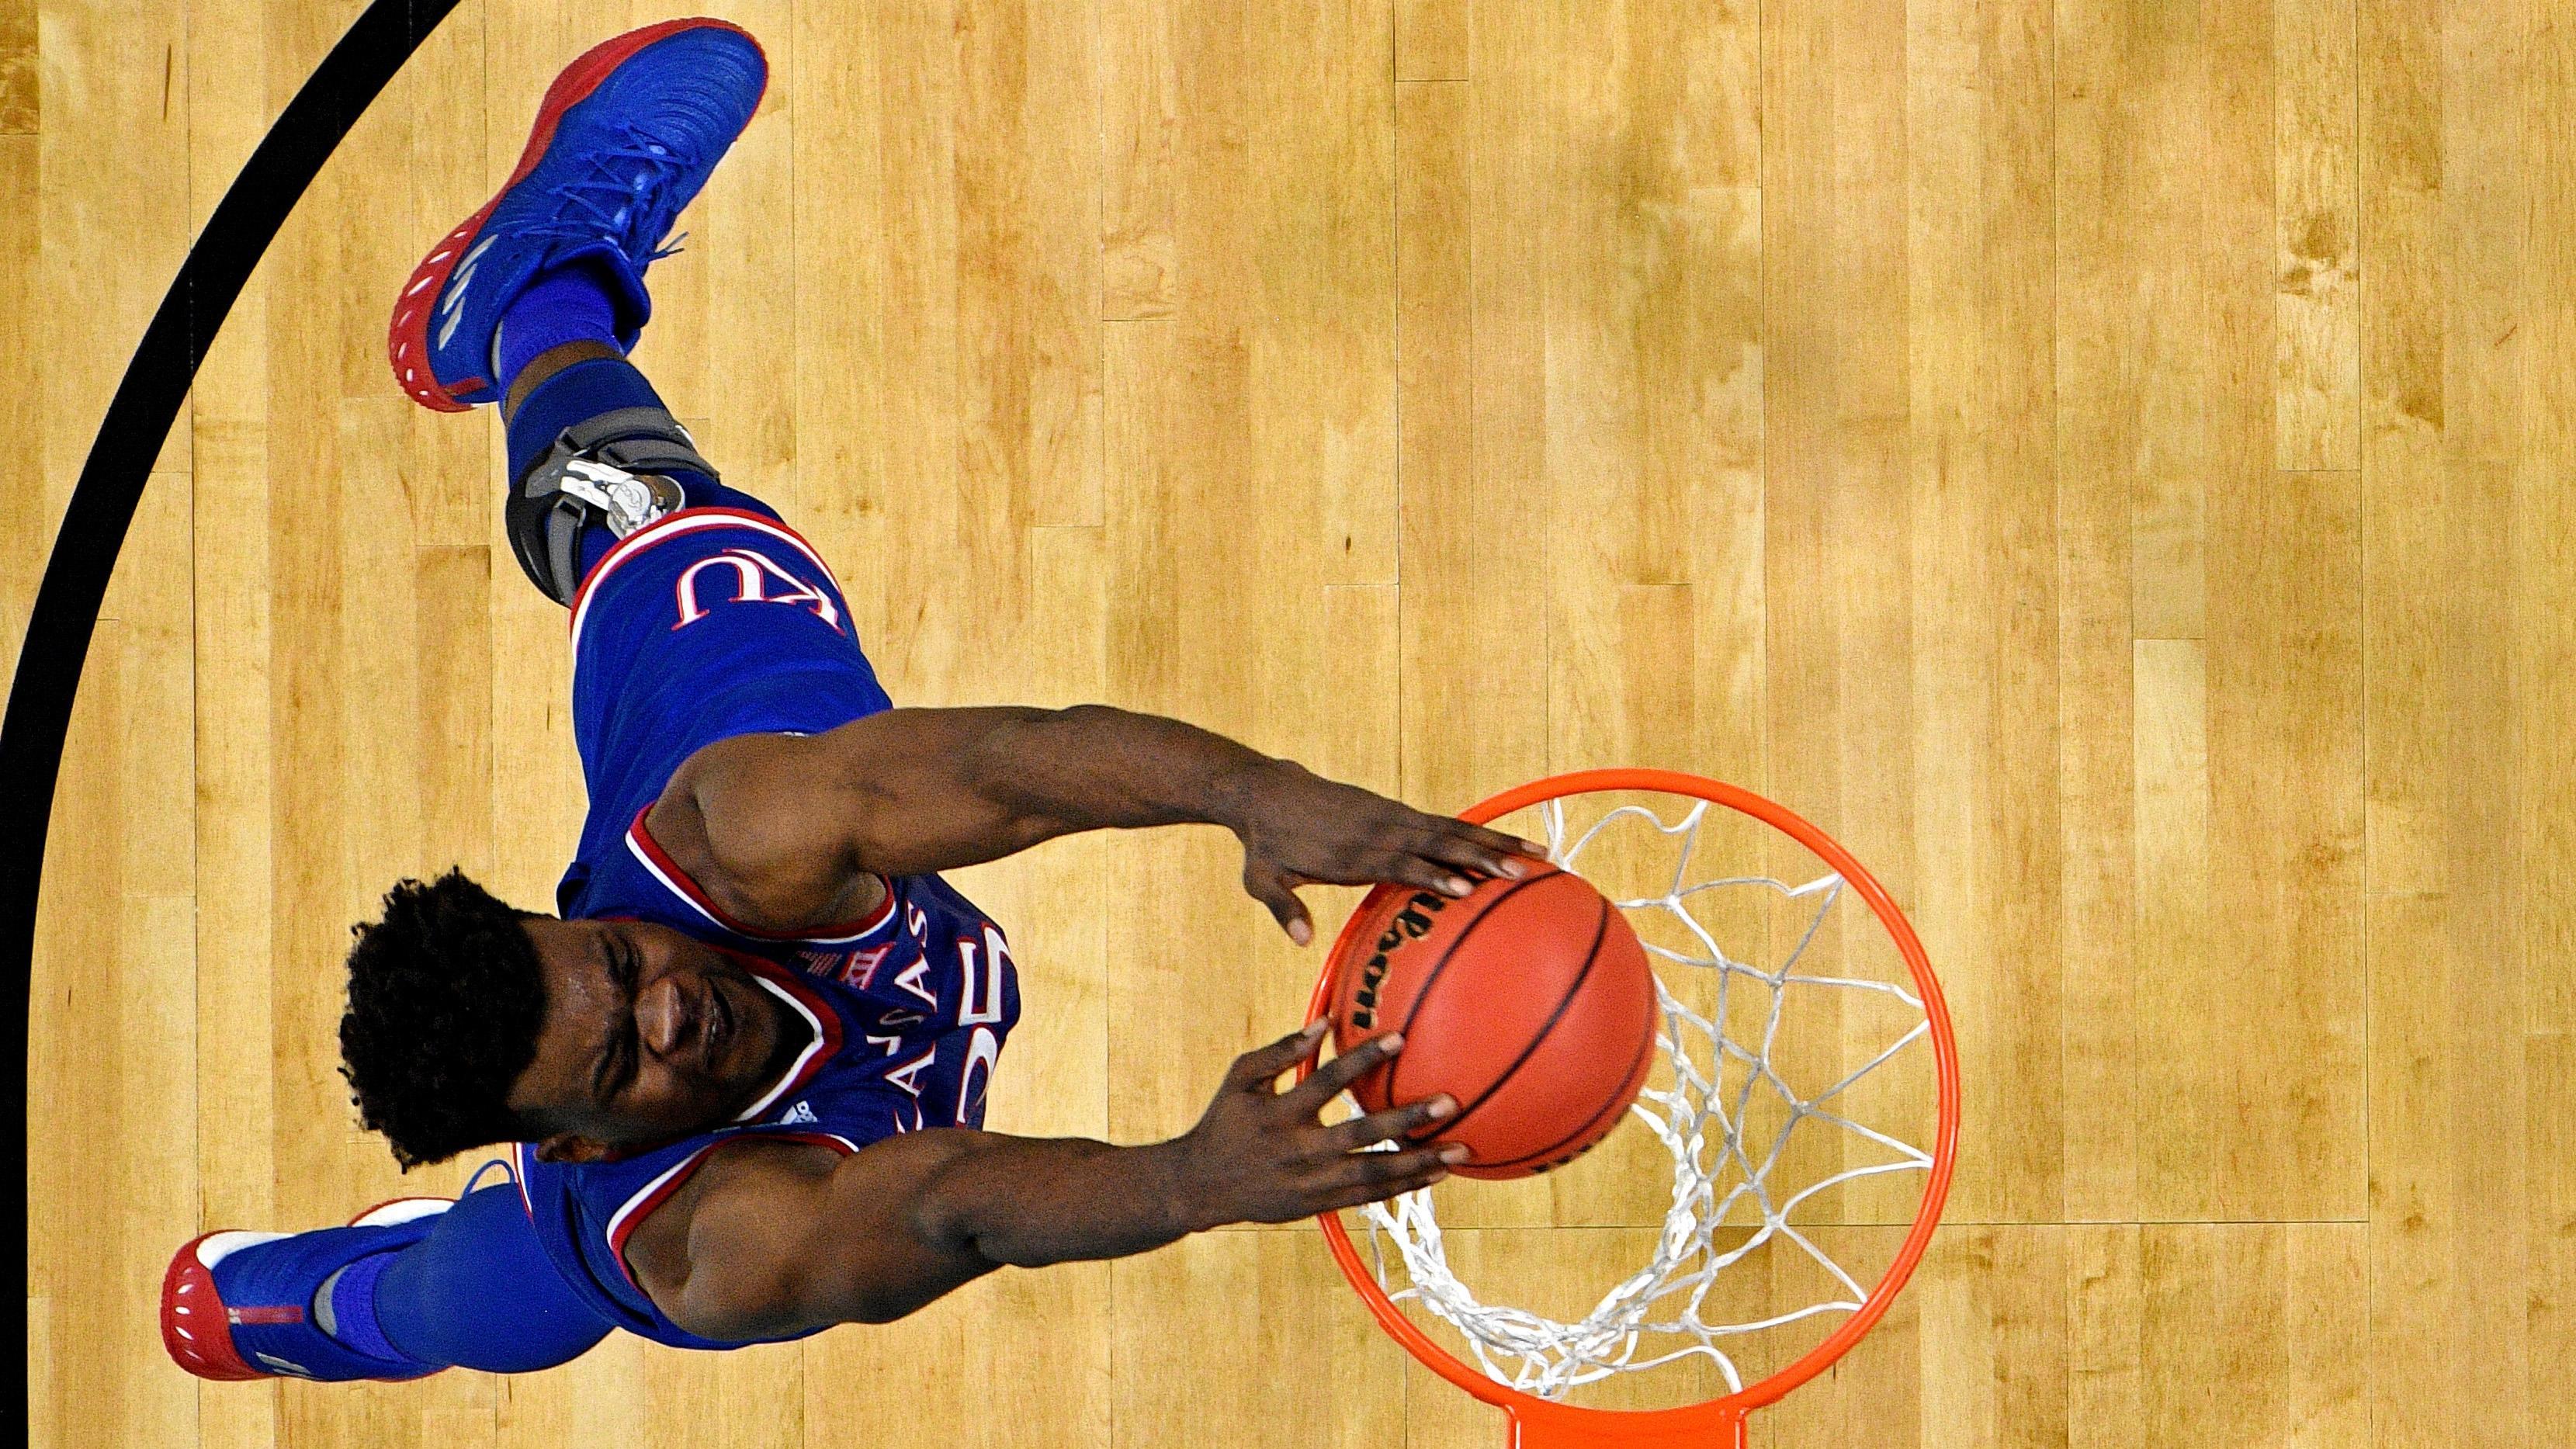 Bob Donnan | USA Today Sports Images